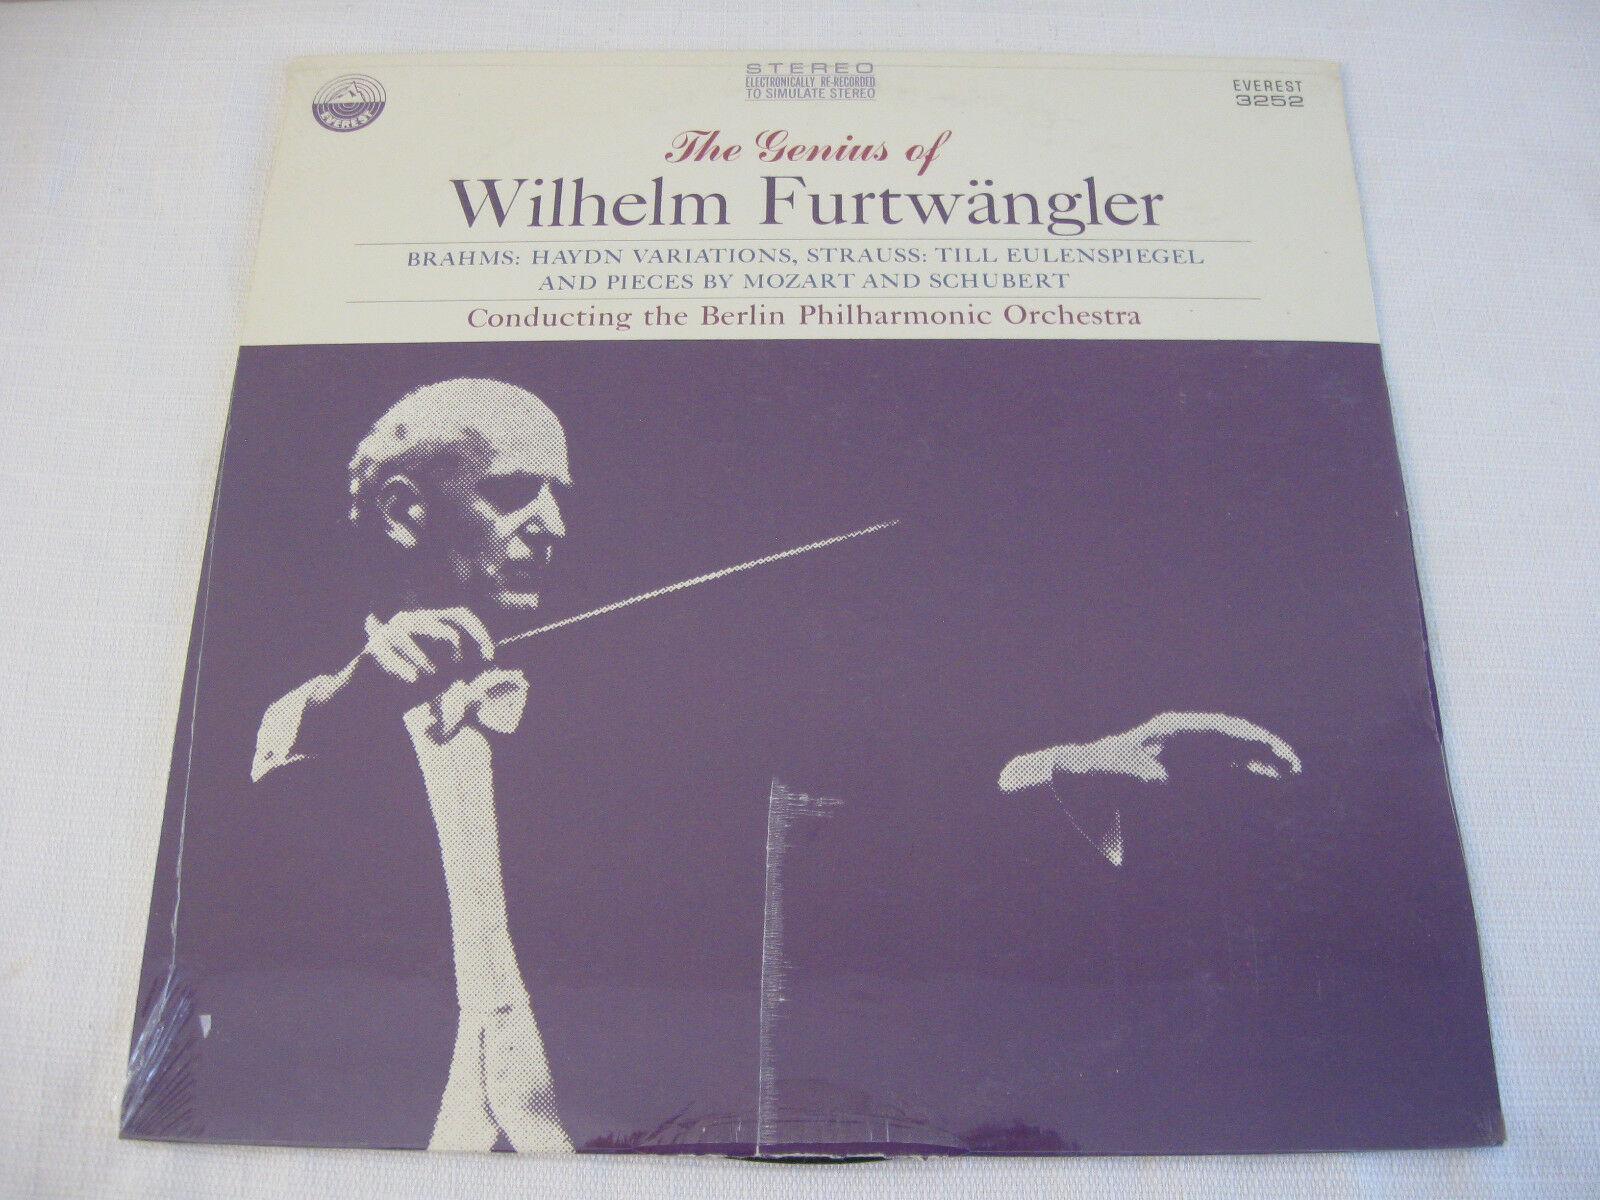 Wilhelm Furtwangler Genius Of Haydn Everest Stereo Vinyl Record Album Sealed LP